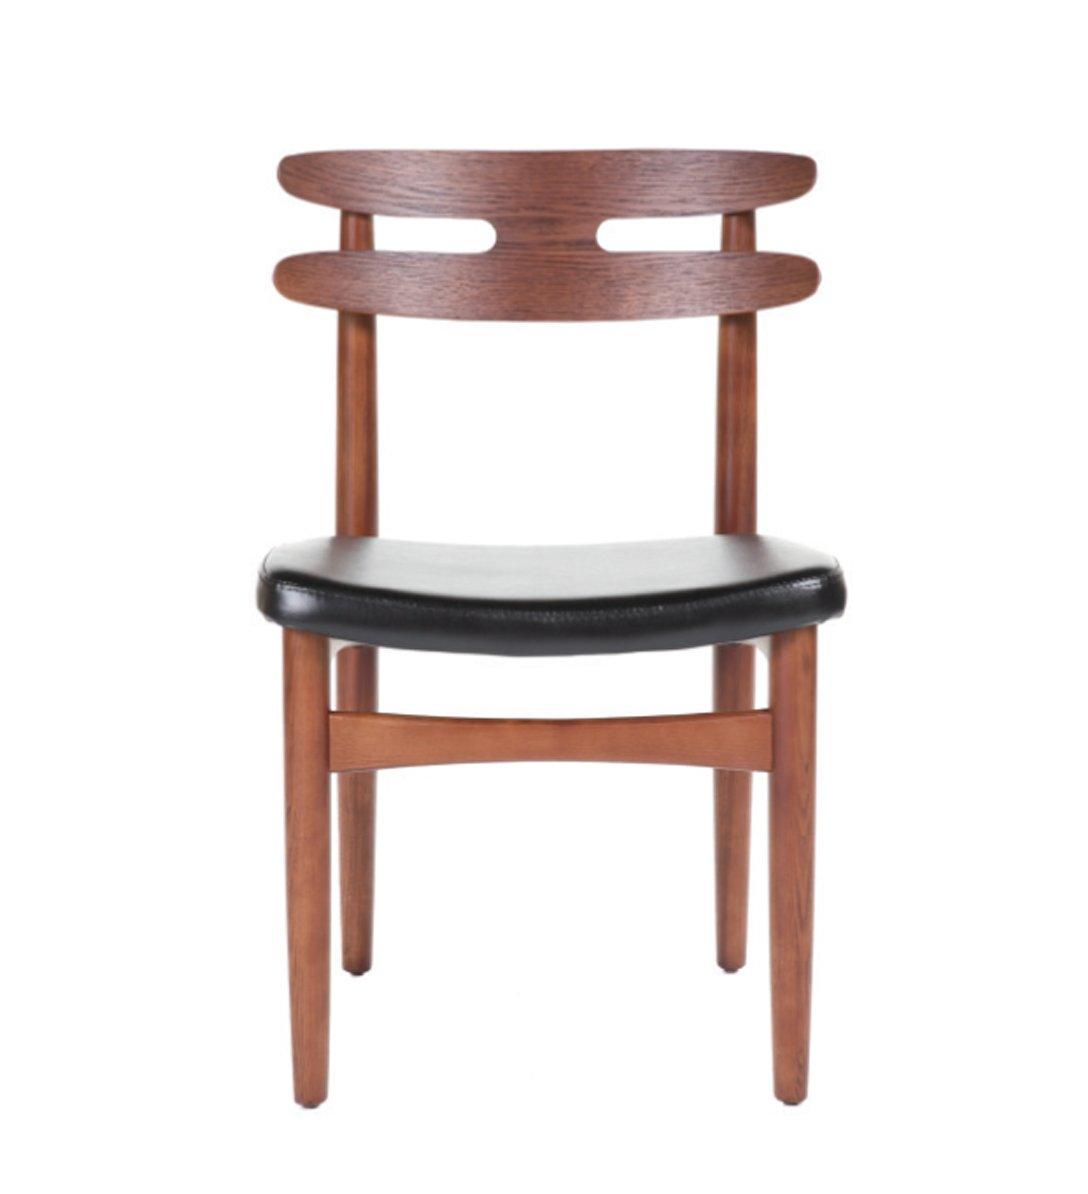 hw klein bramin chair - leatherette